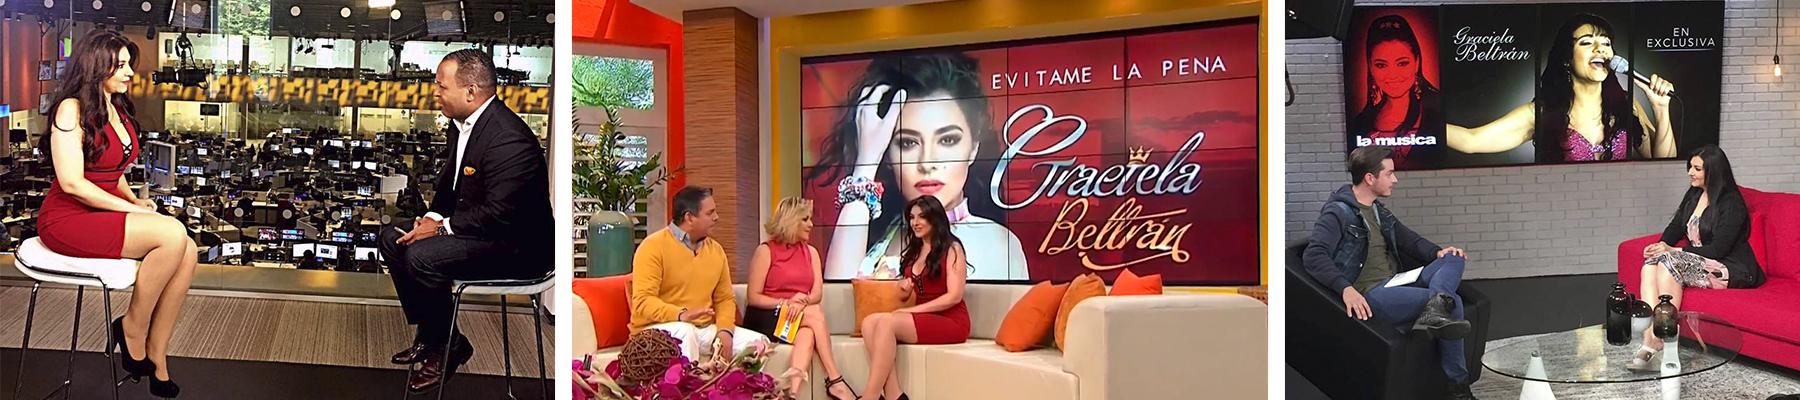 Graciela Beltran banner